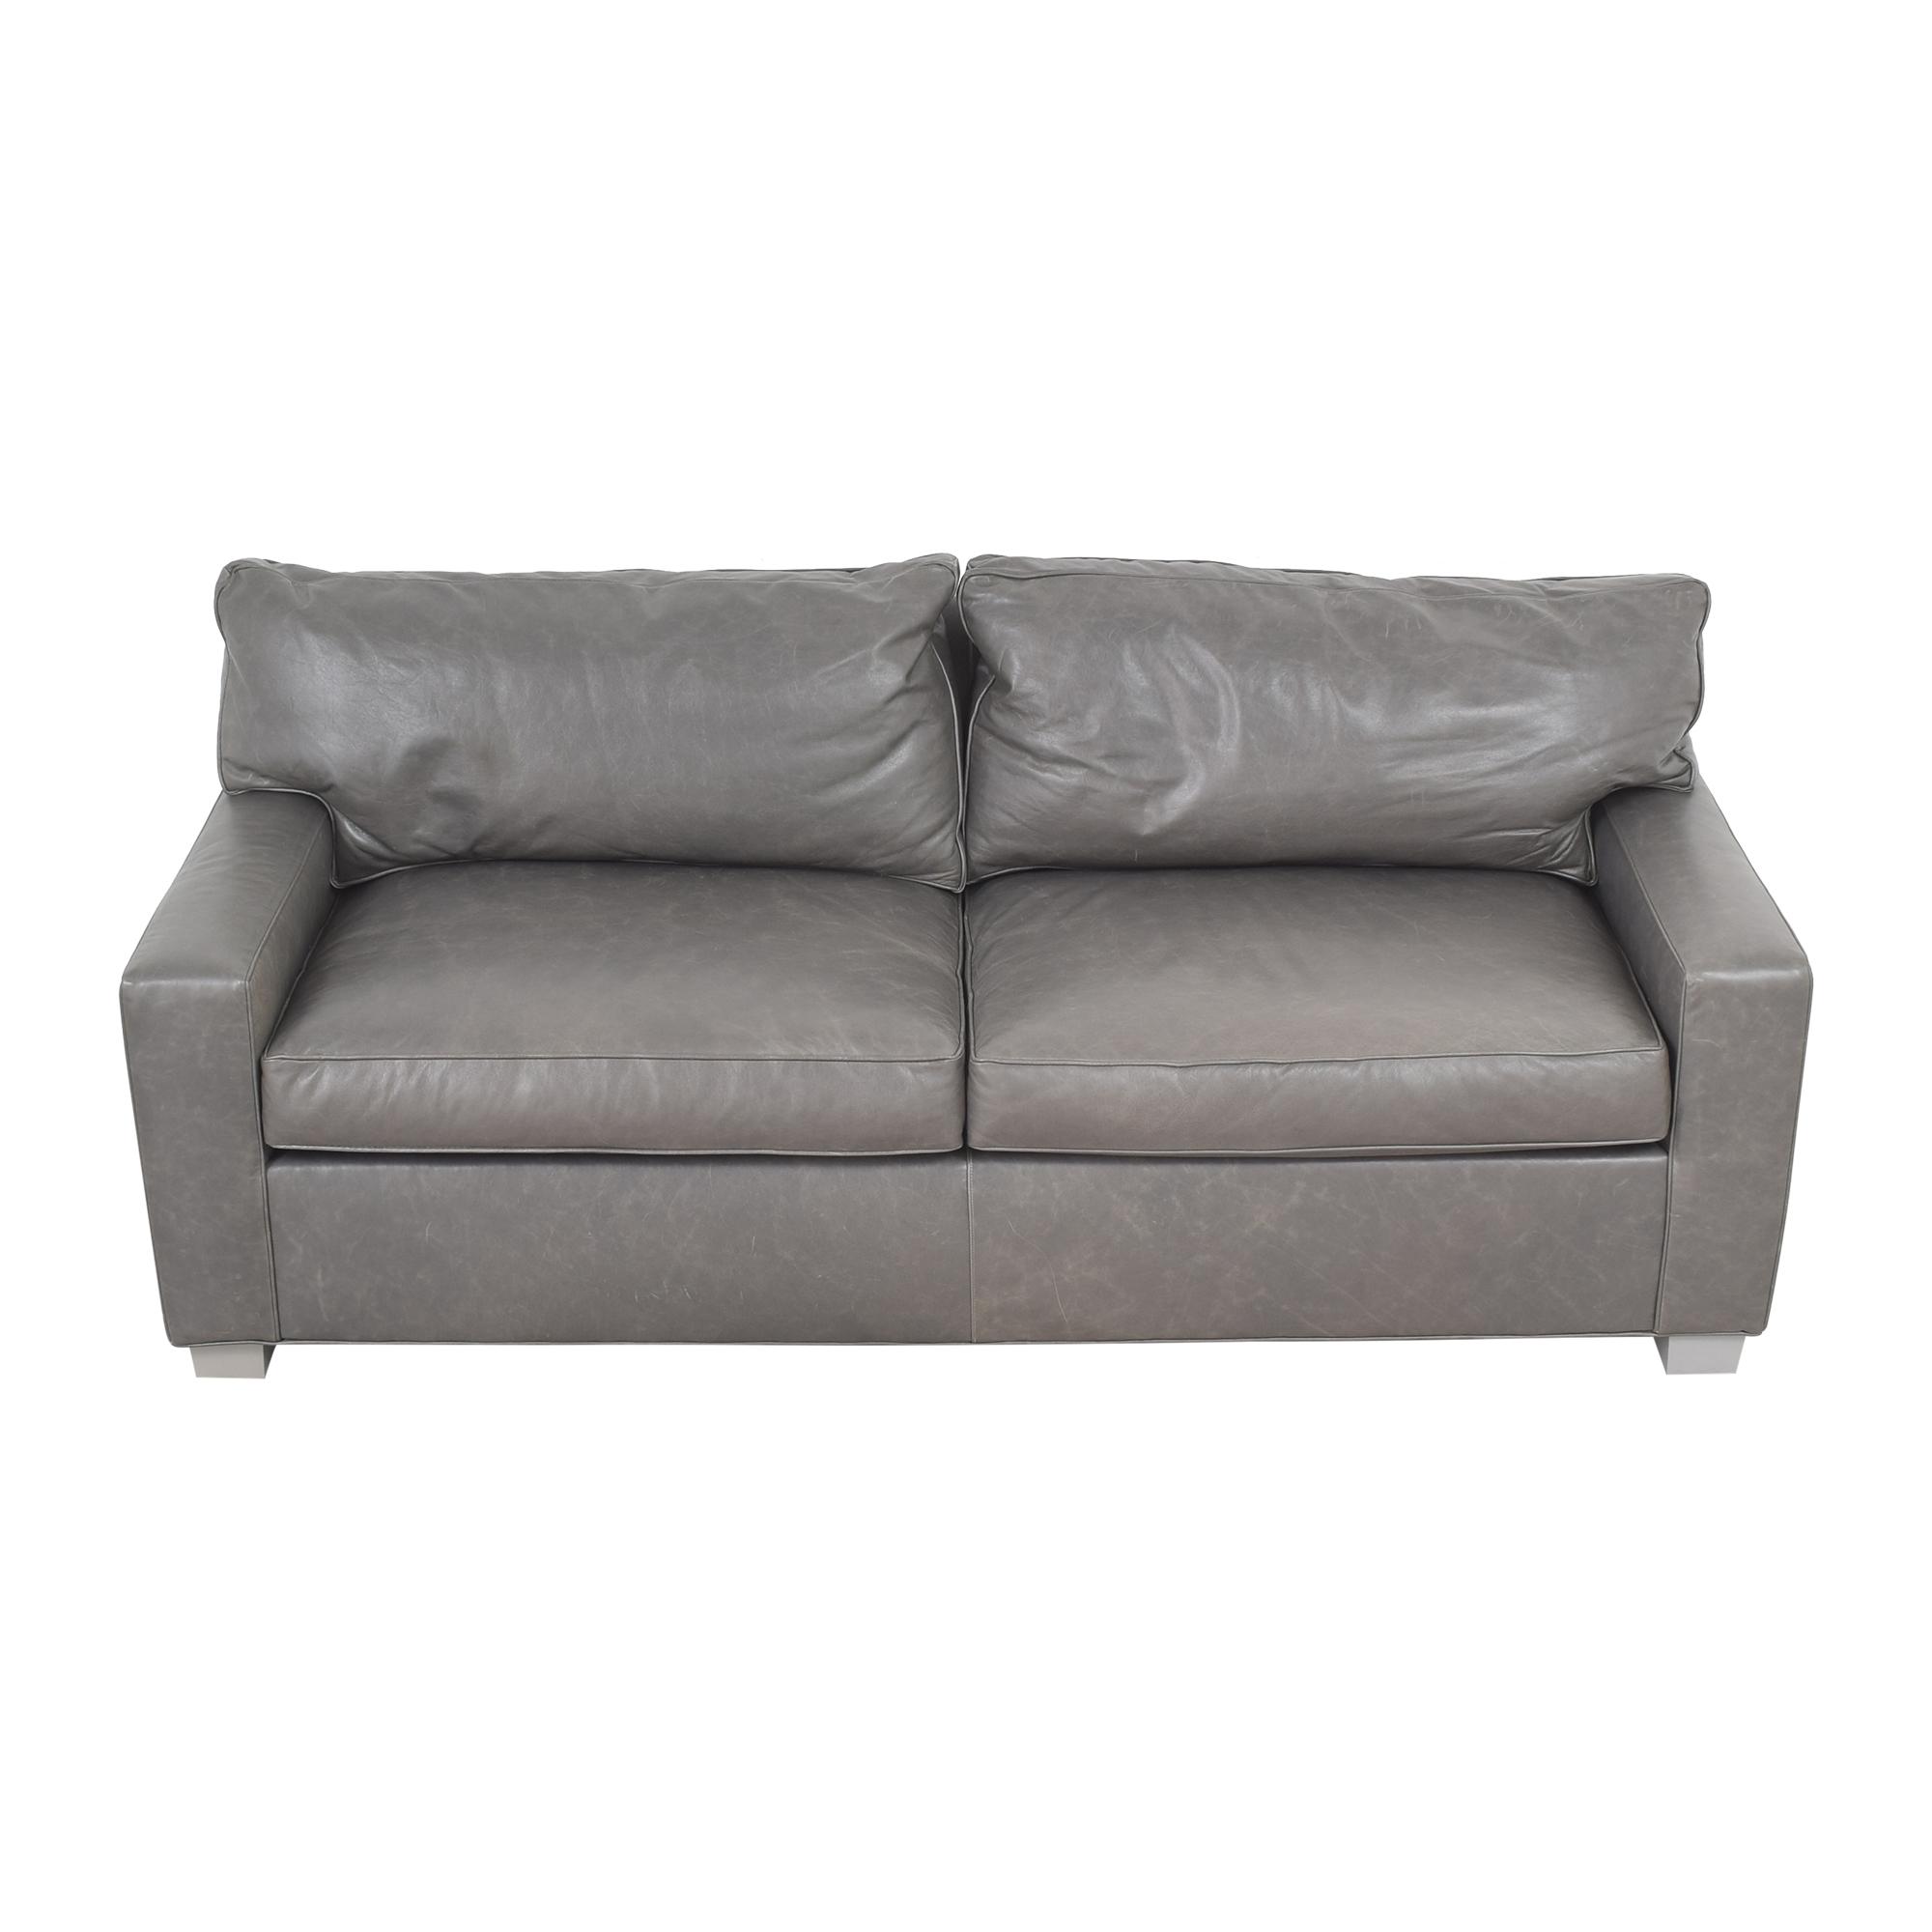 buy Mitchell Gold + Bob Williams Alex Two Cushion Sofa Mitchell Gold + Bob Williams Classic Sofas